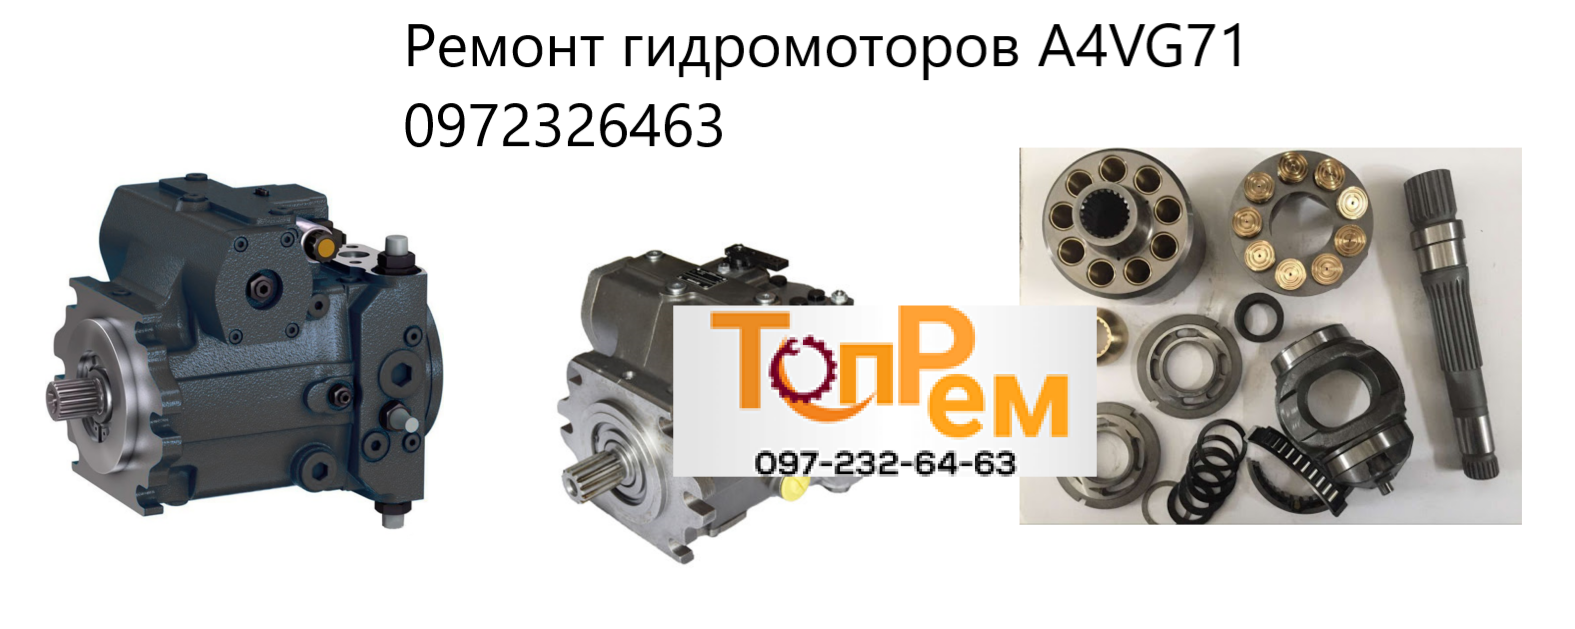 Ремонт гидромотора A4VG71